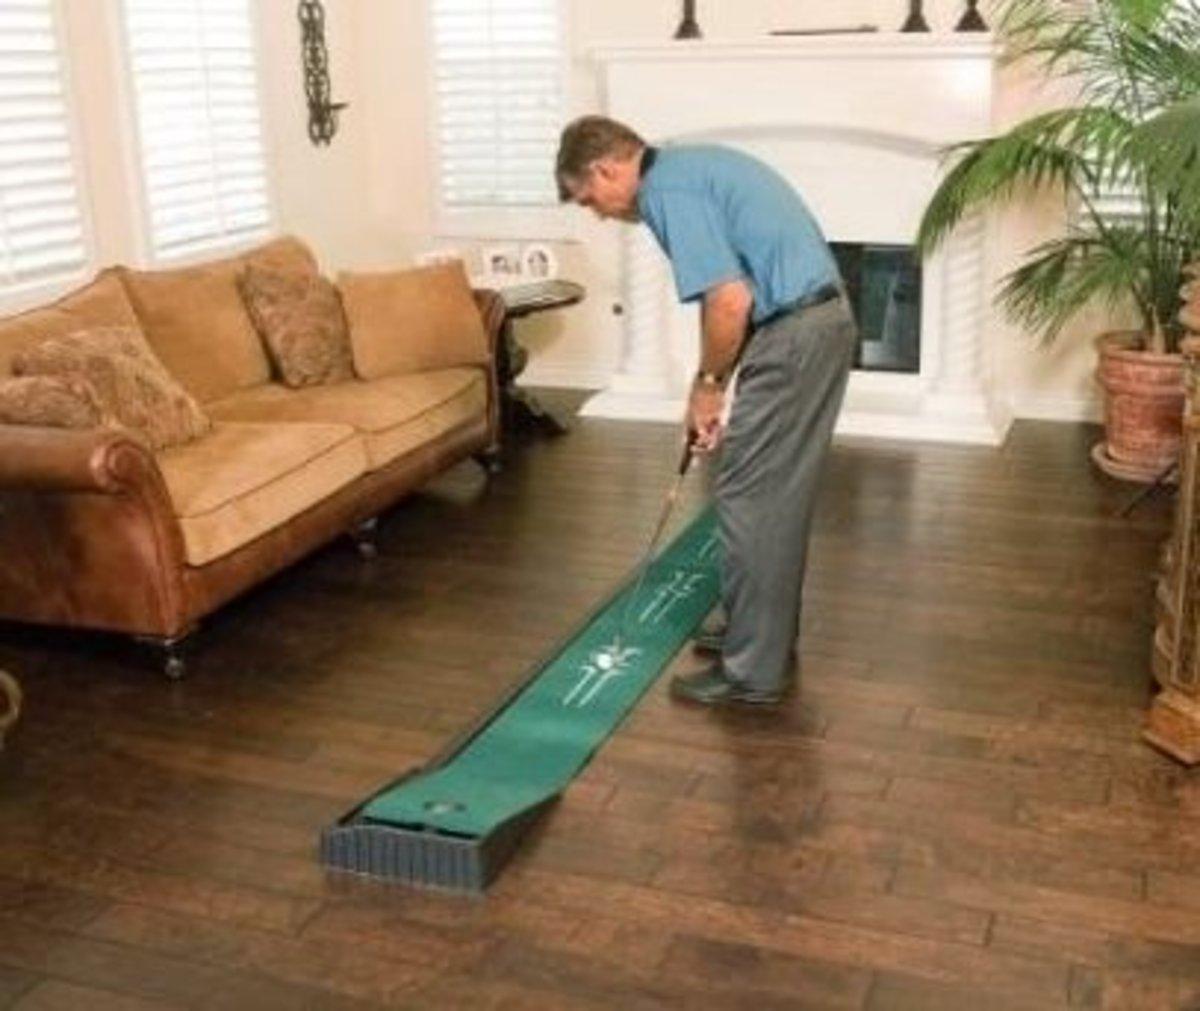 An indoor putting green.